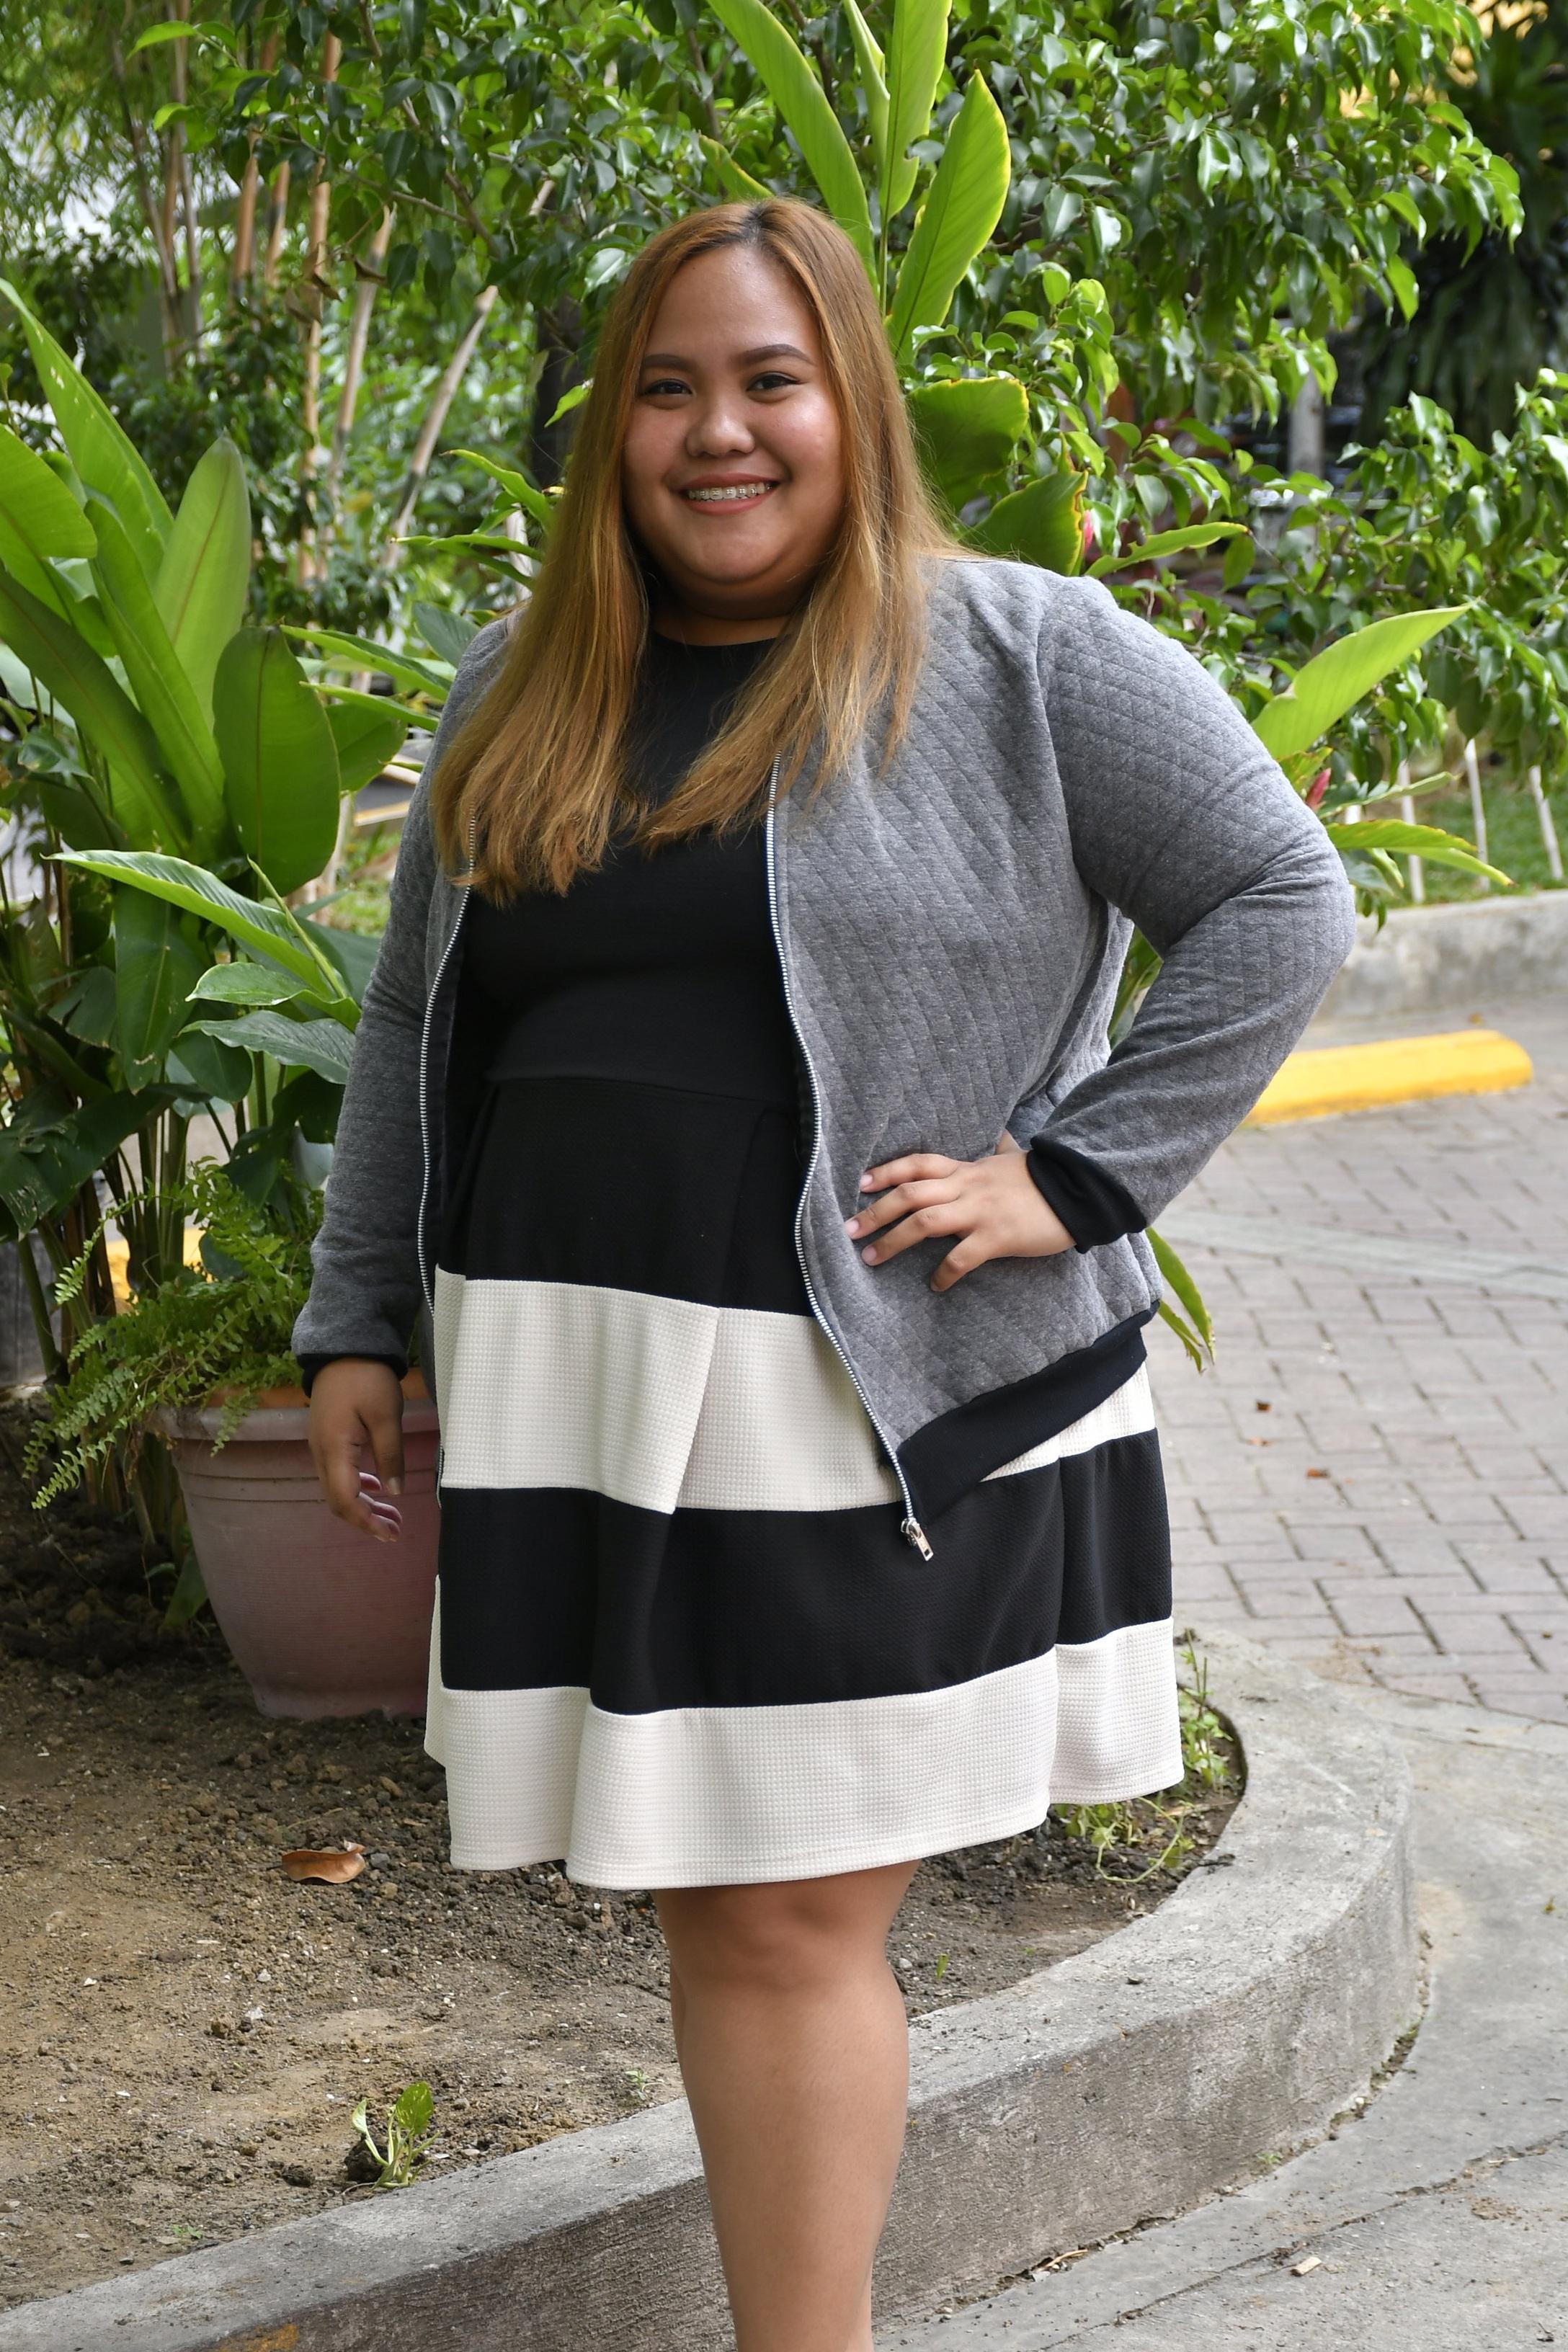 Samantha Fay Abellana - paraplanner